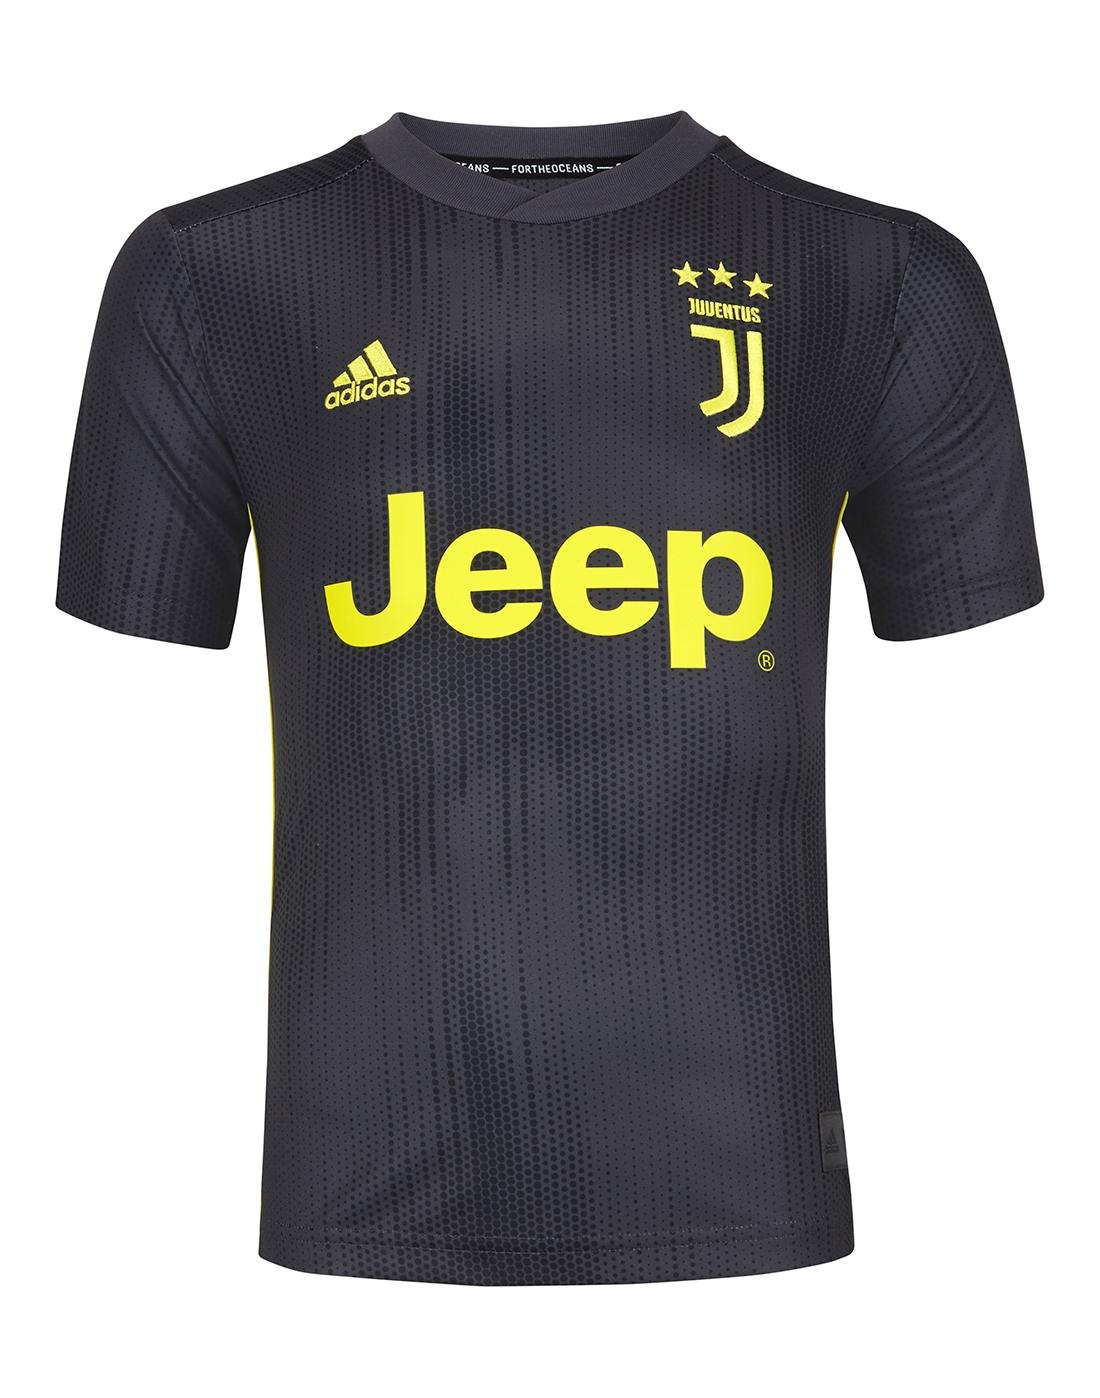 741dbdd0d Kids Juventus 18 19 Third Jersey ...